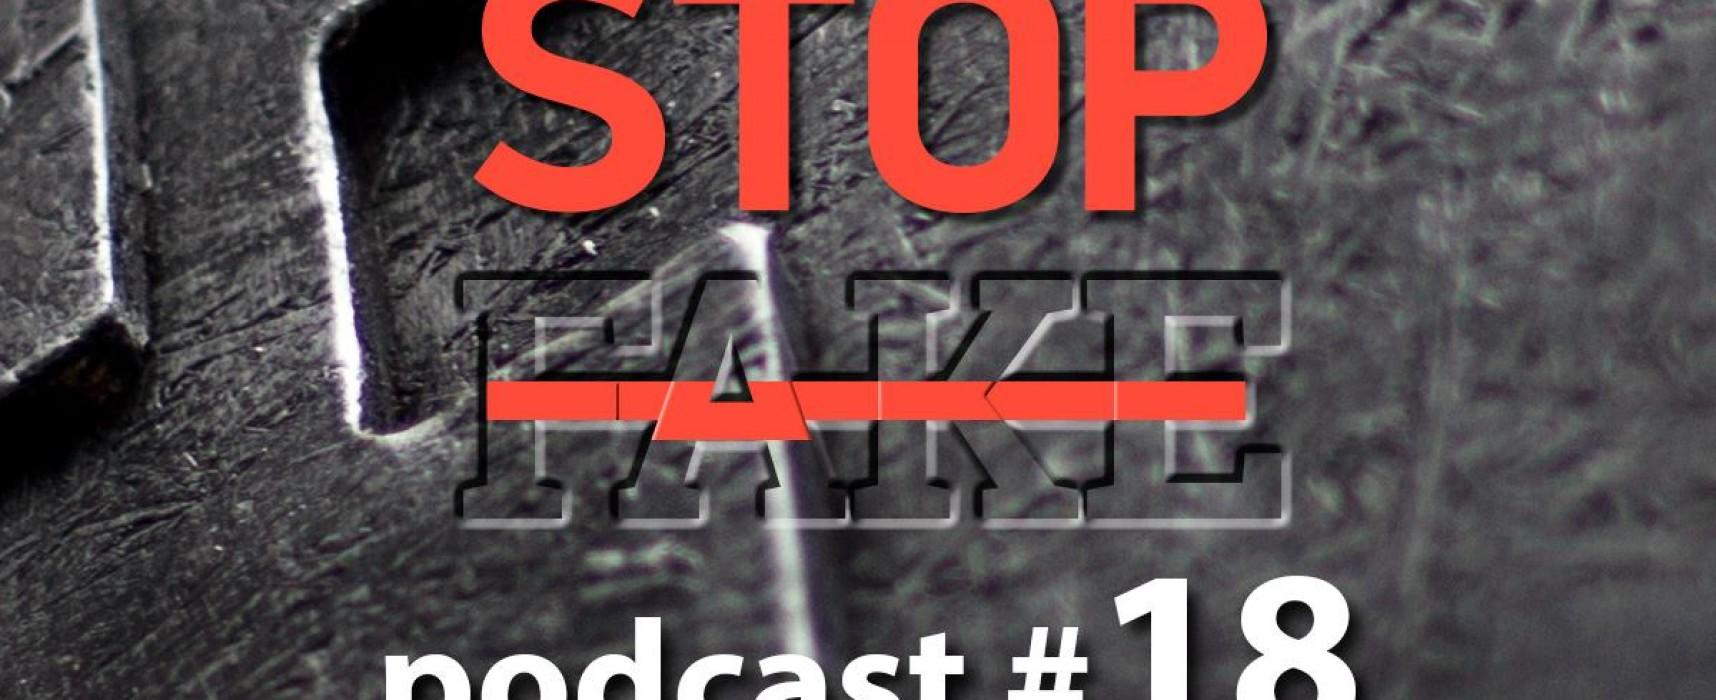 StopFake podcast #18